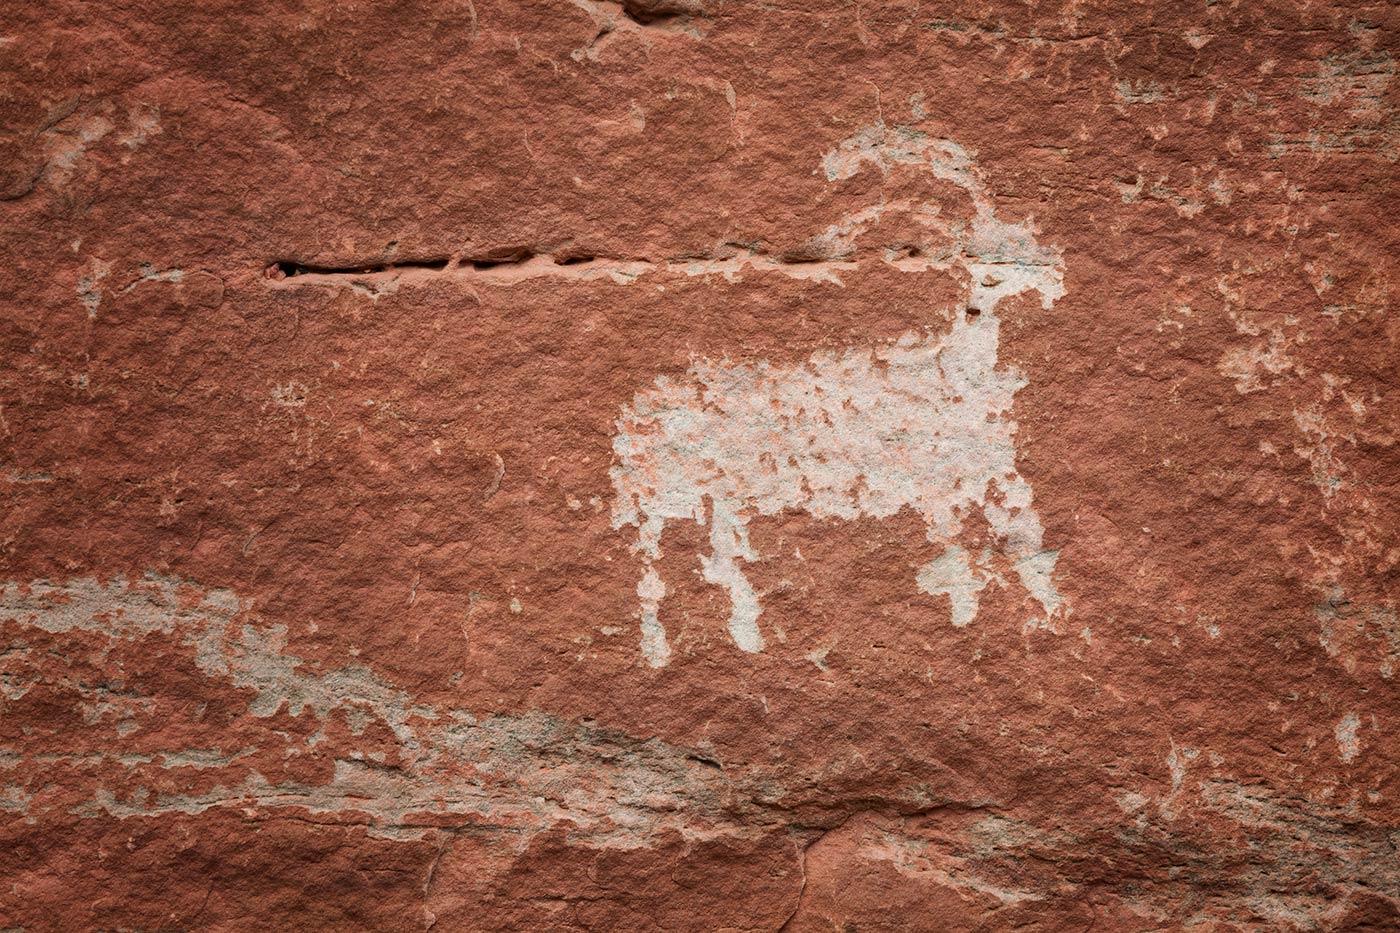 Ancient-Cultures_ABP_Petroglyph_Deer_Potash2.jpg